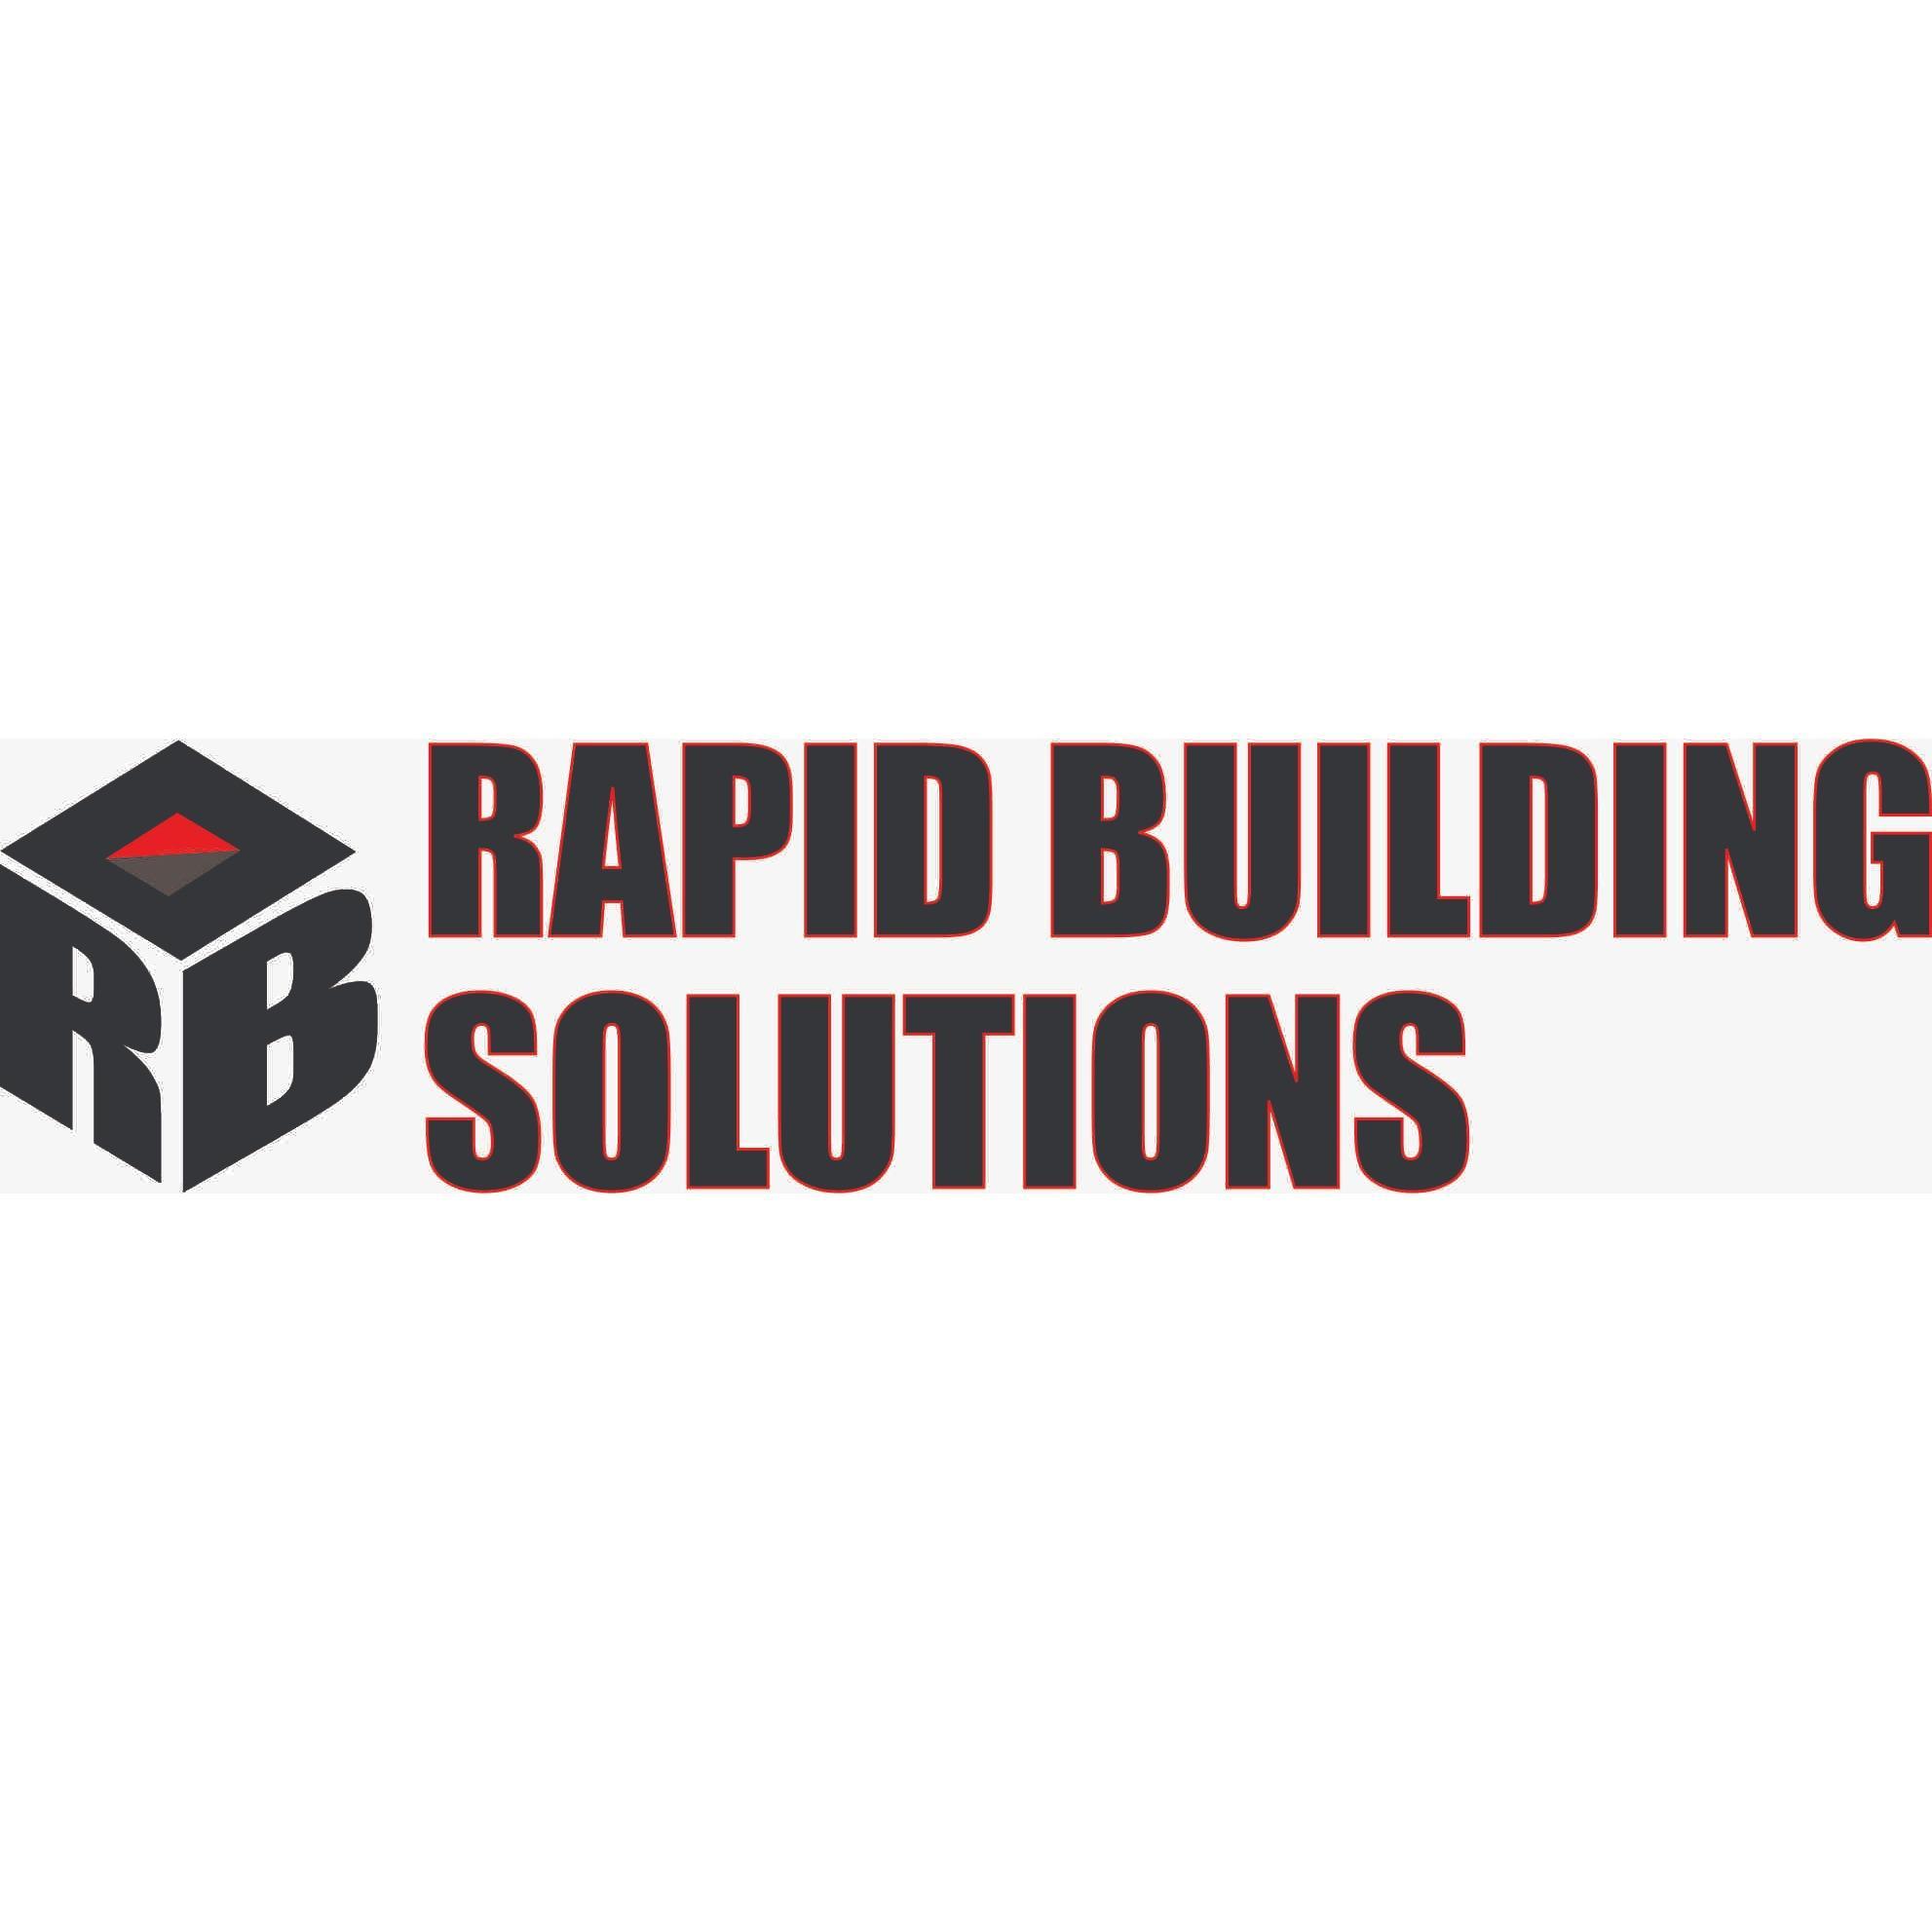 Rapid Building Solutions